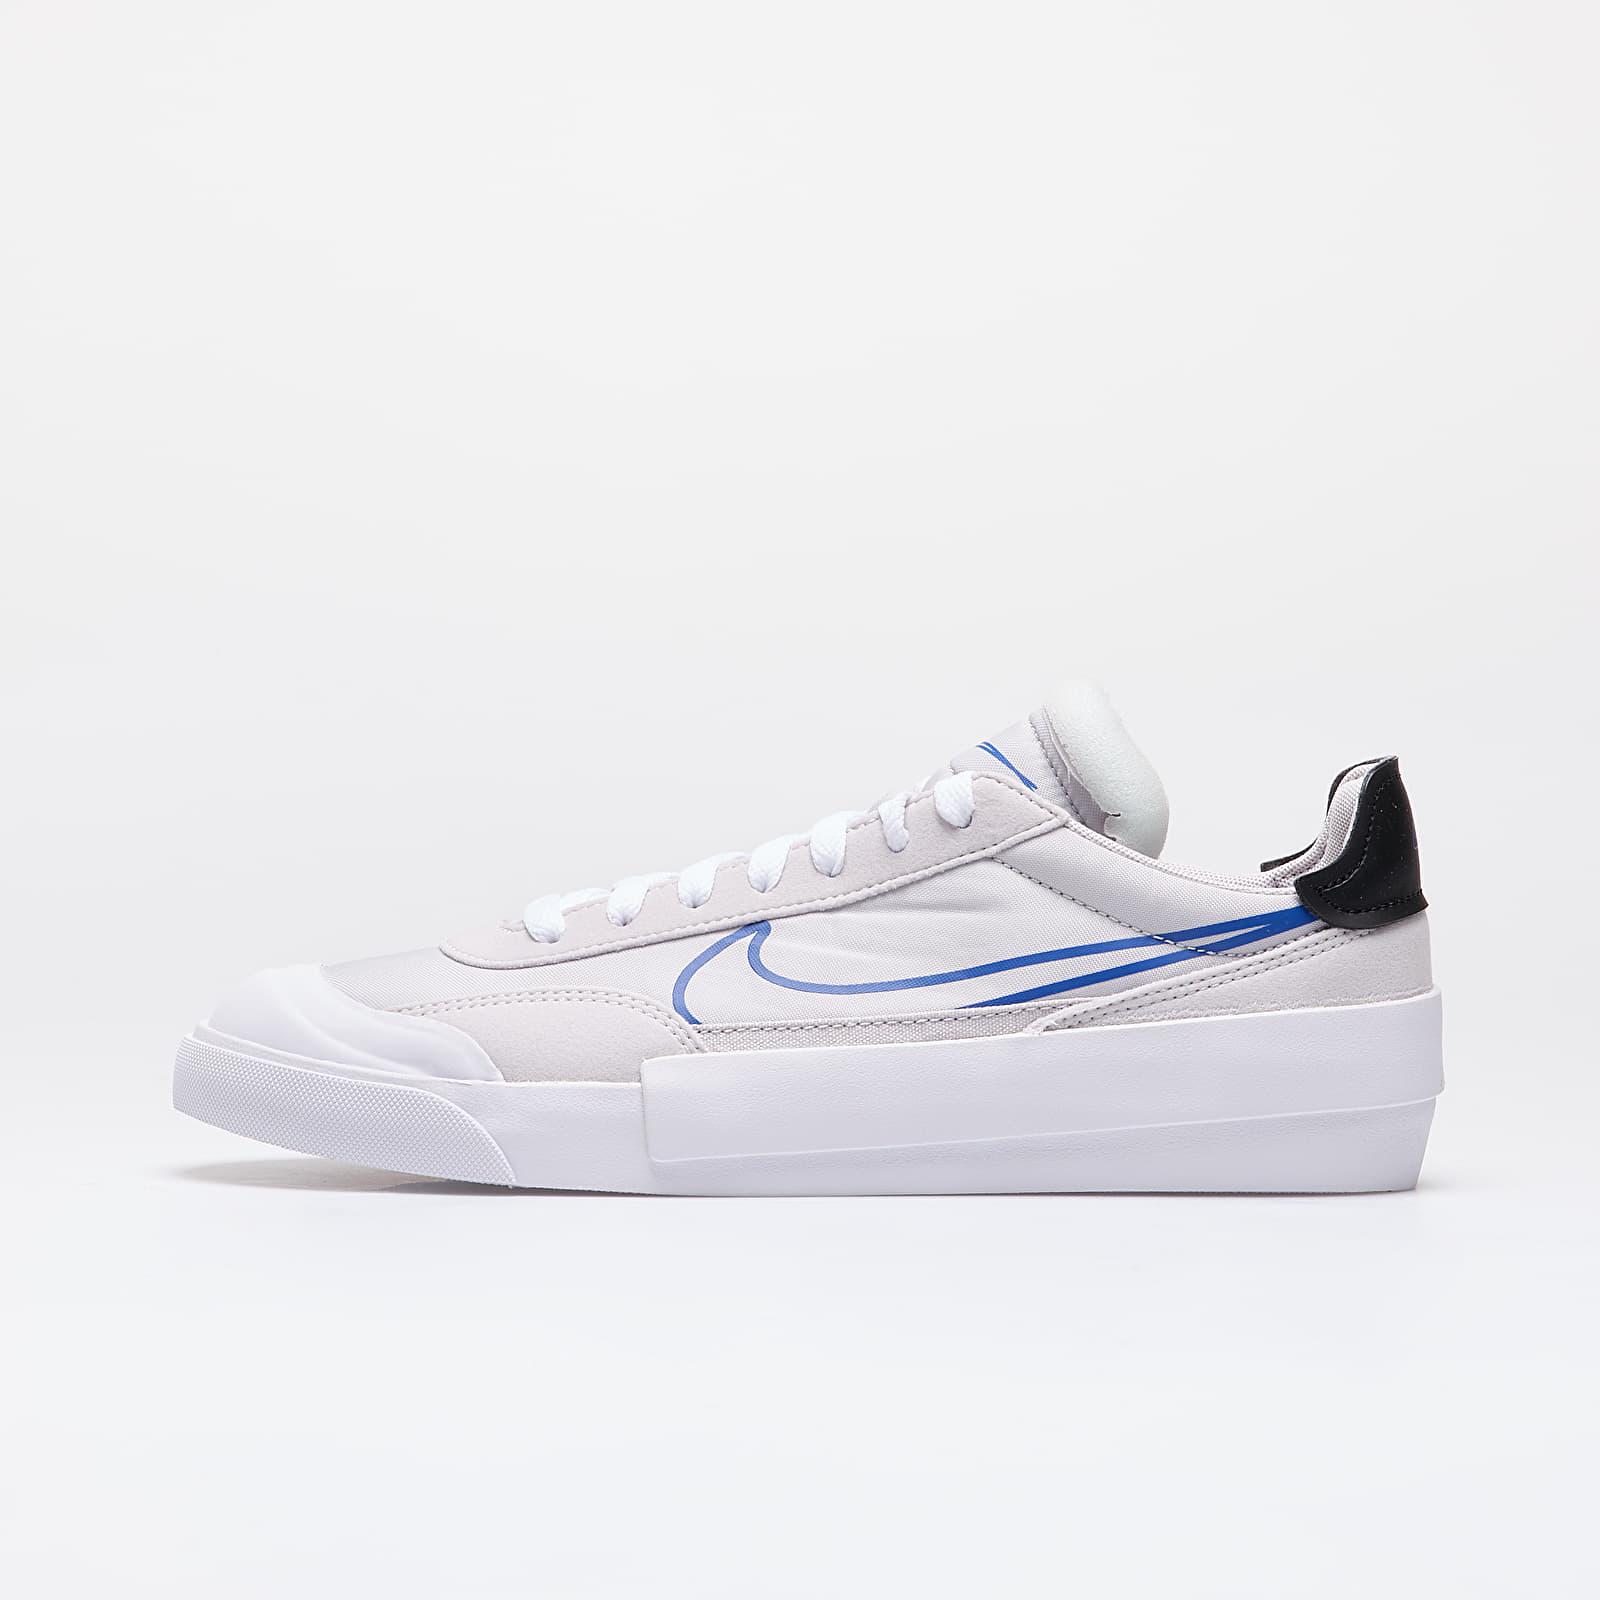 Männer Nike Drop-Type Hbr Vast Grey/ Hyper Blue-Black-White